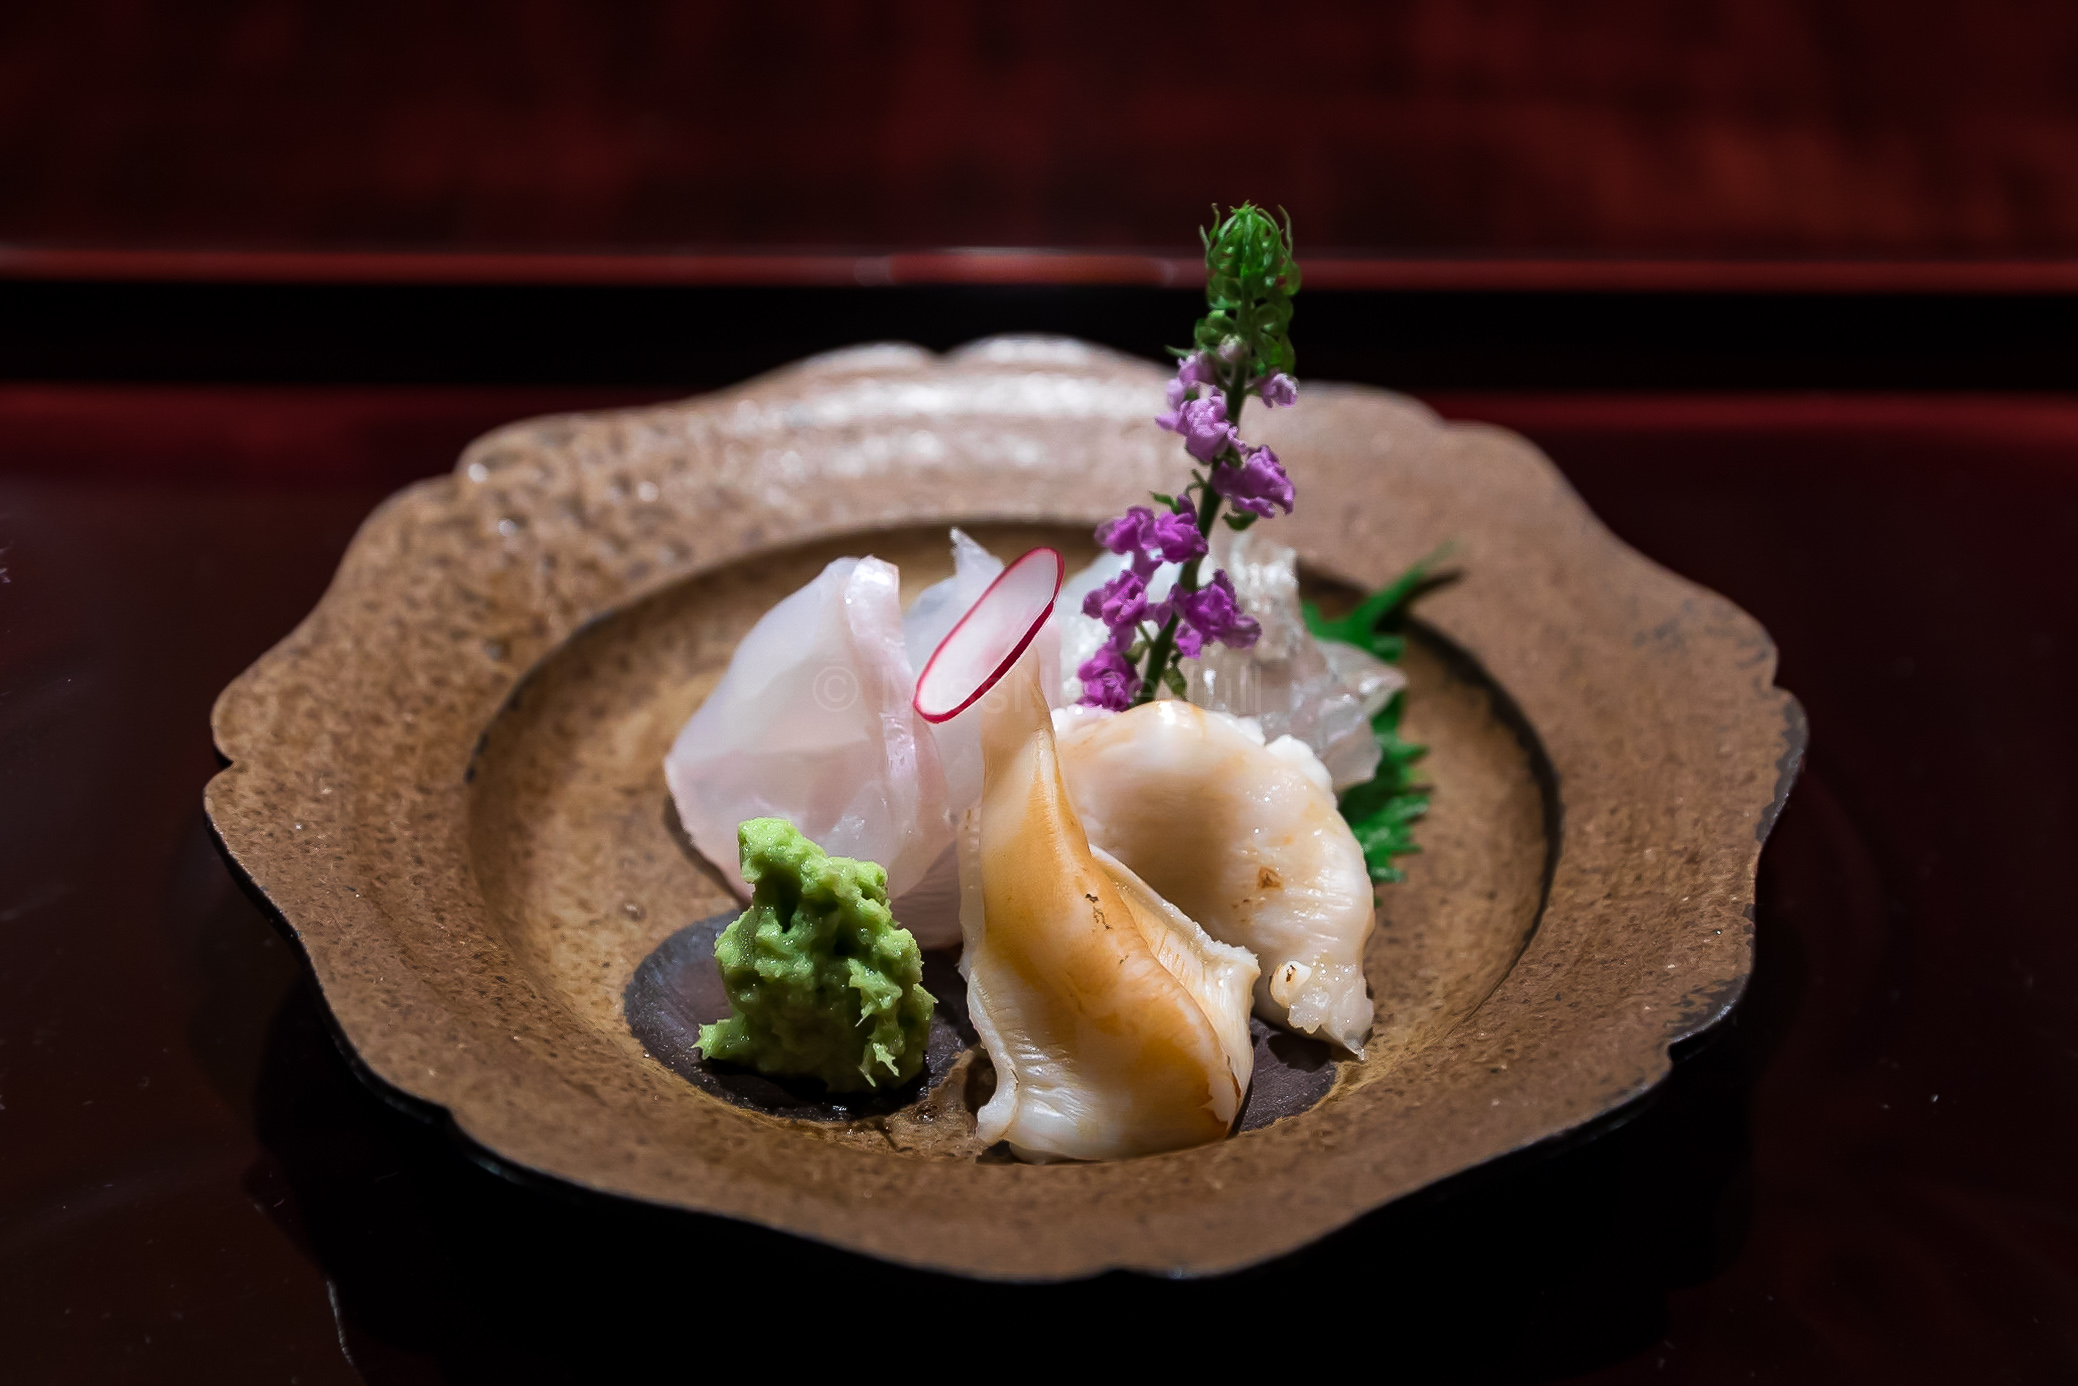 3. Kue (longtooth grouper), Mako-garei (marbled sole), Ishigaki gai (giant clam) | お造里:クエ、真子鰈、石垣貝